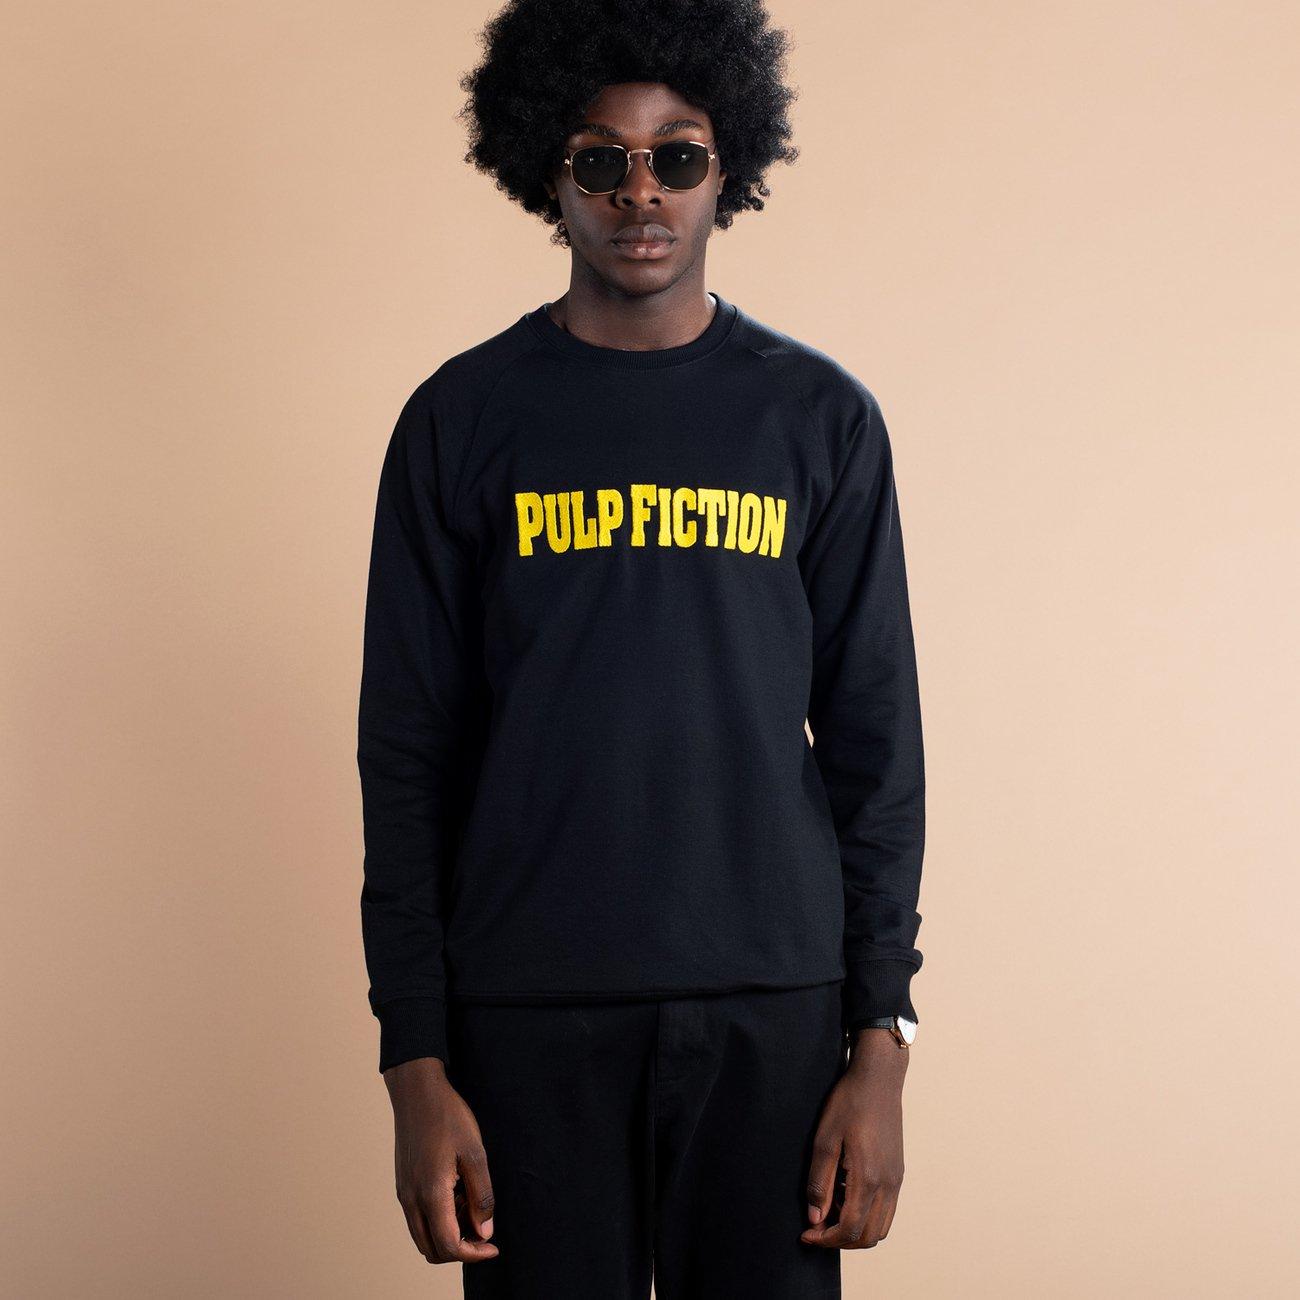 Sweatshirt Malmoe Pulp Fiction